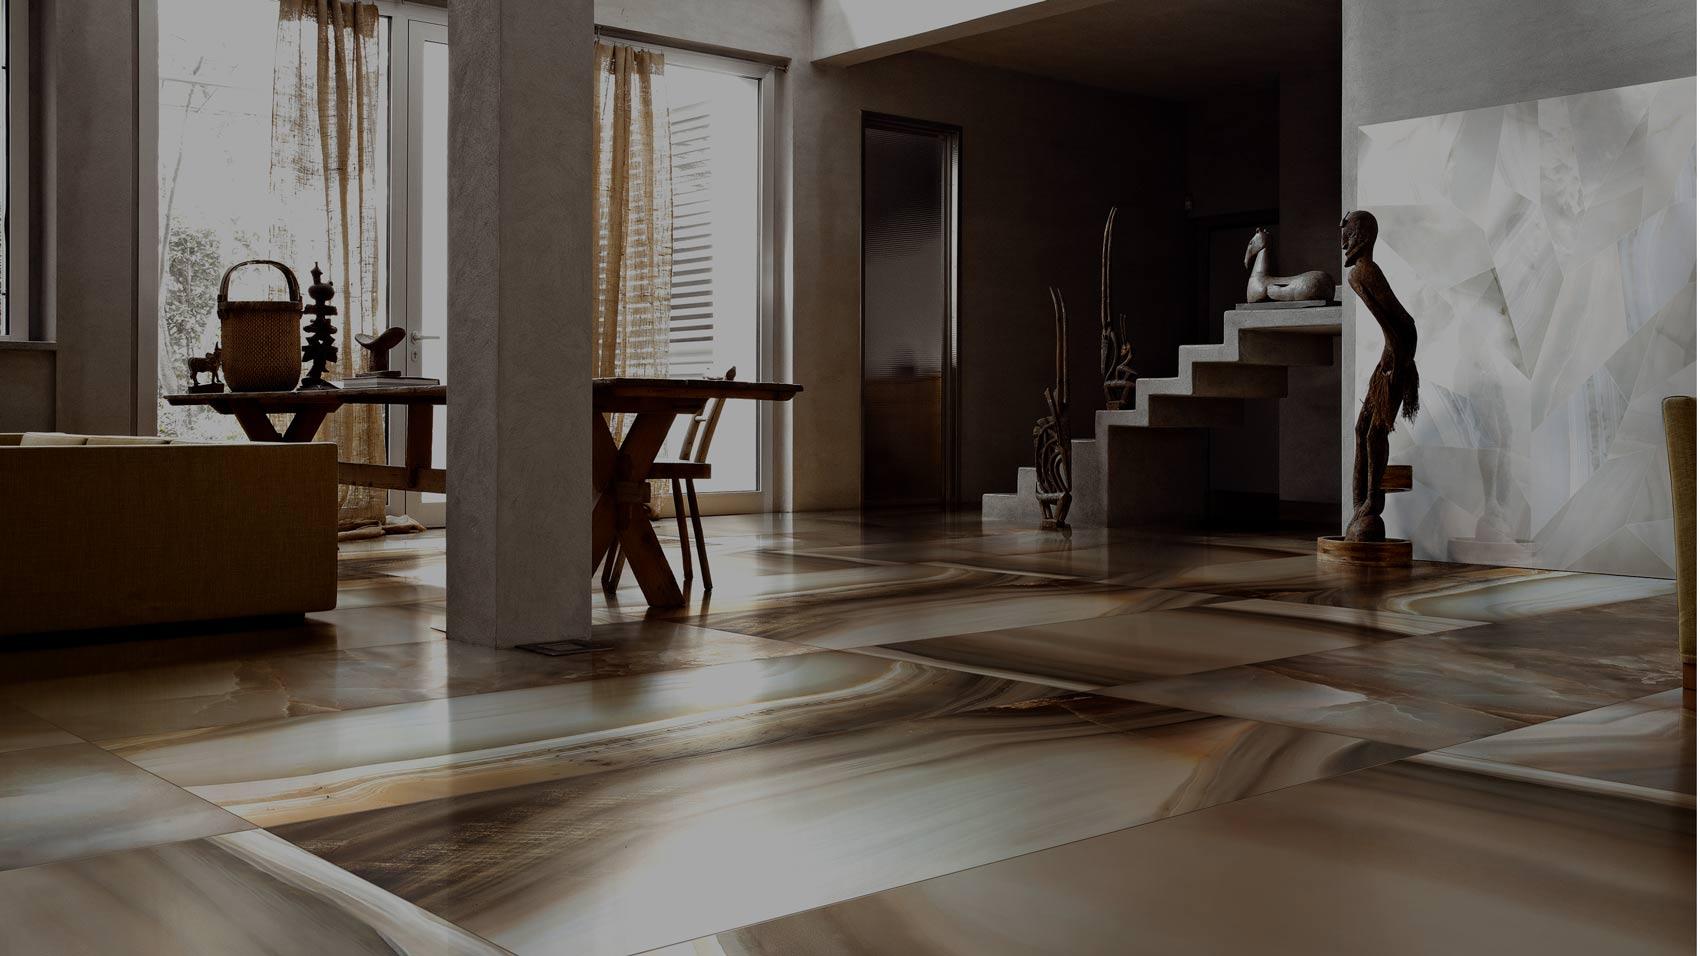 looks porcelin porcelain floors img wood floor like tile that